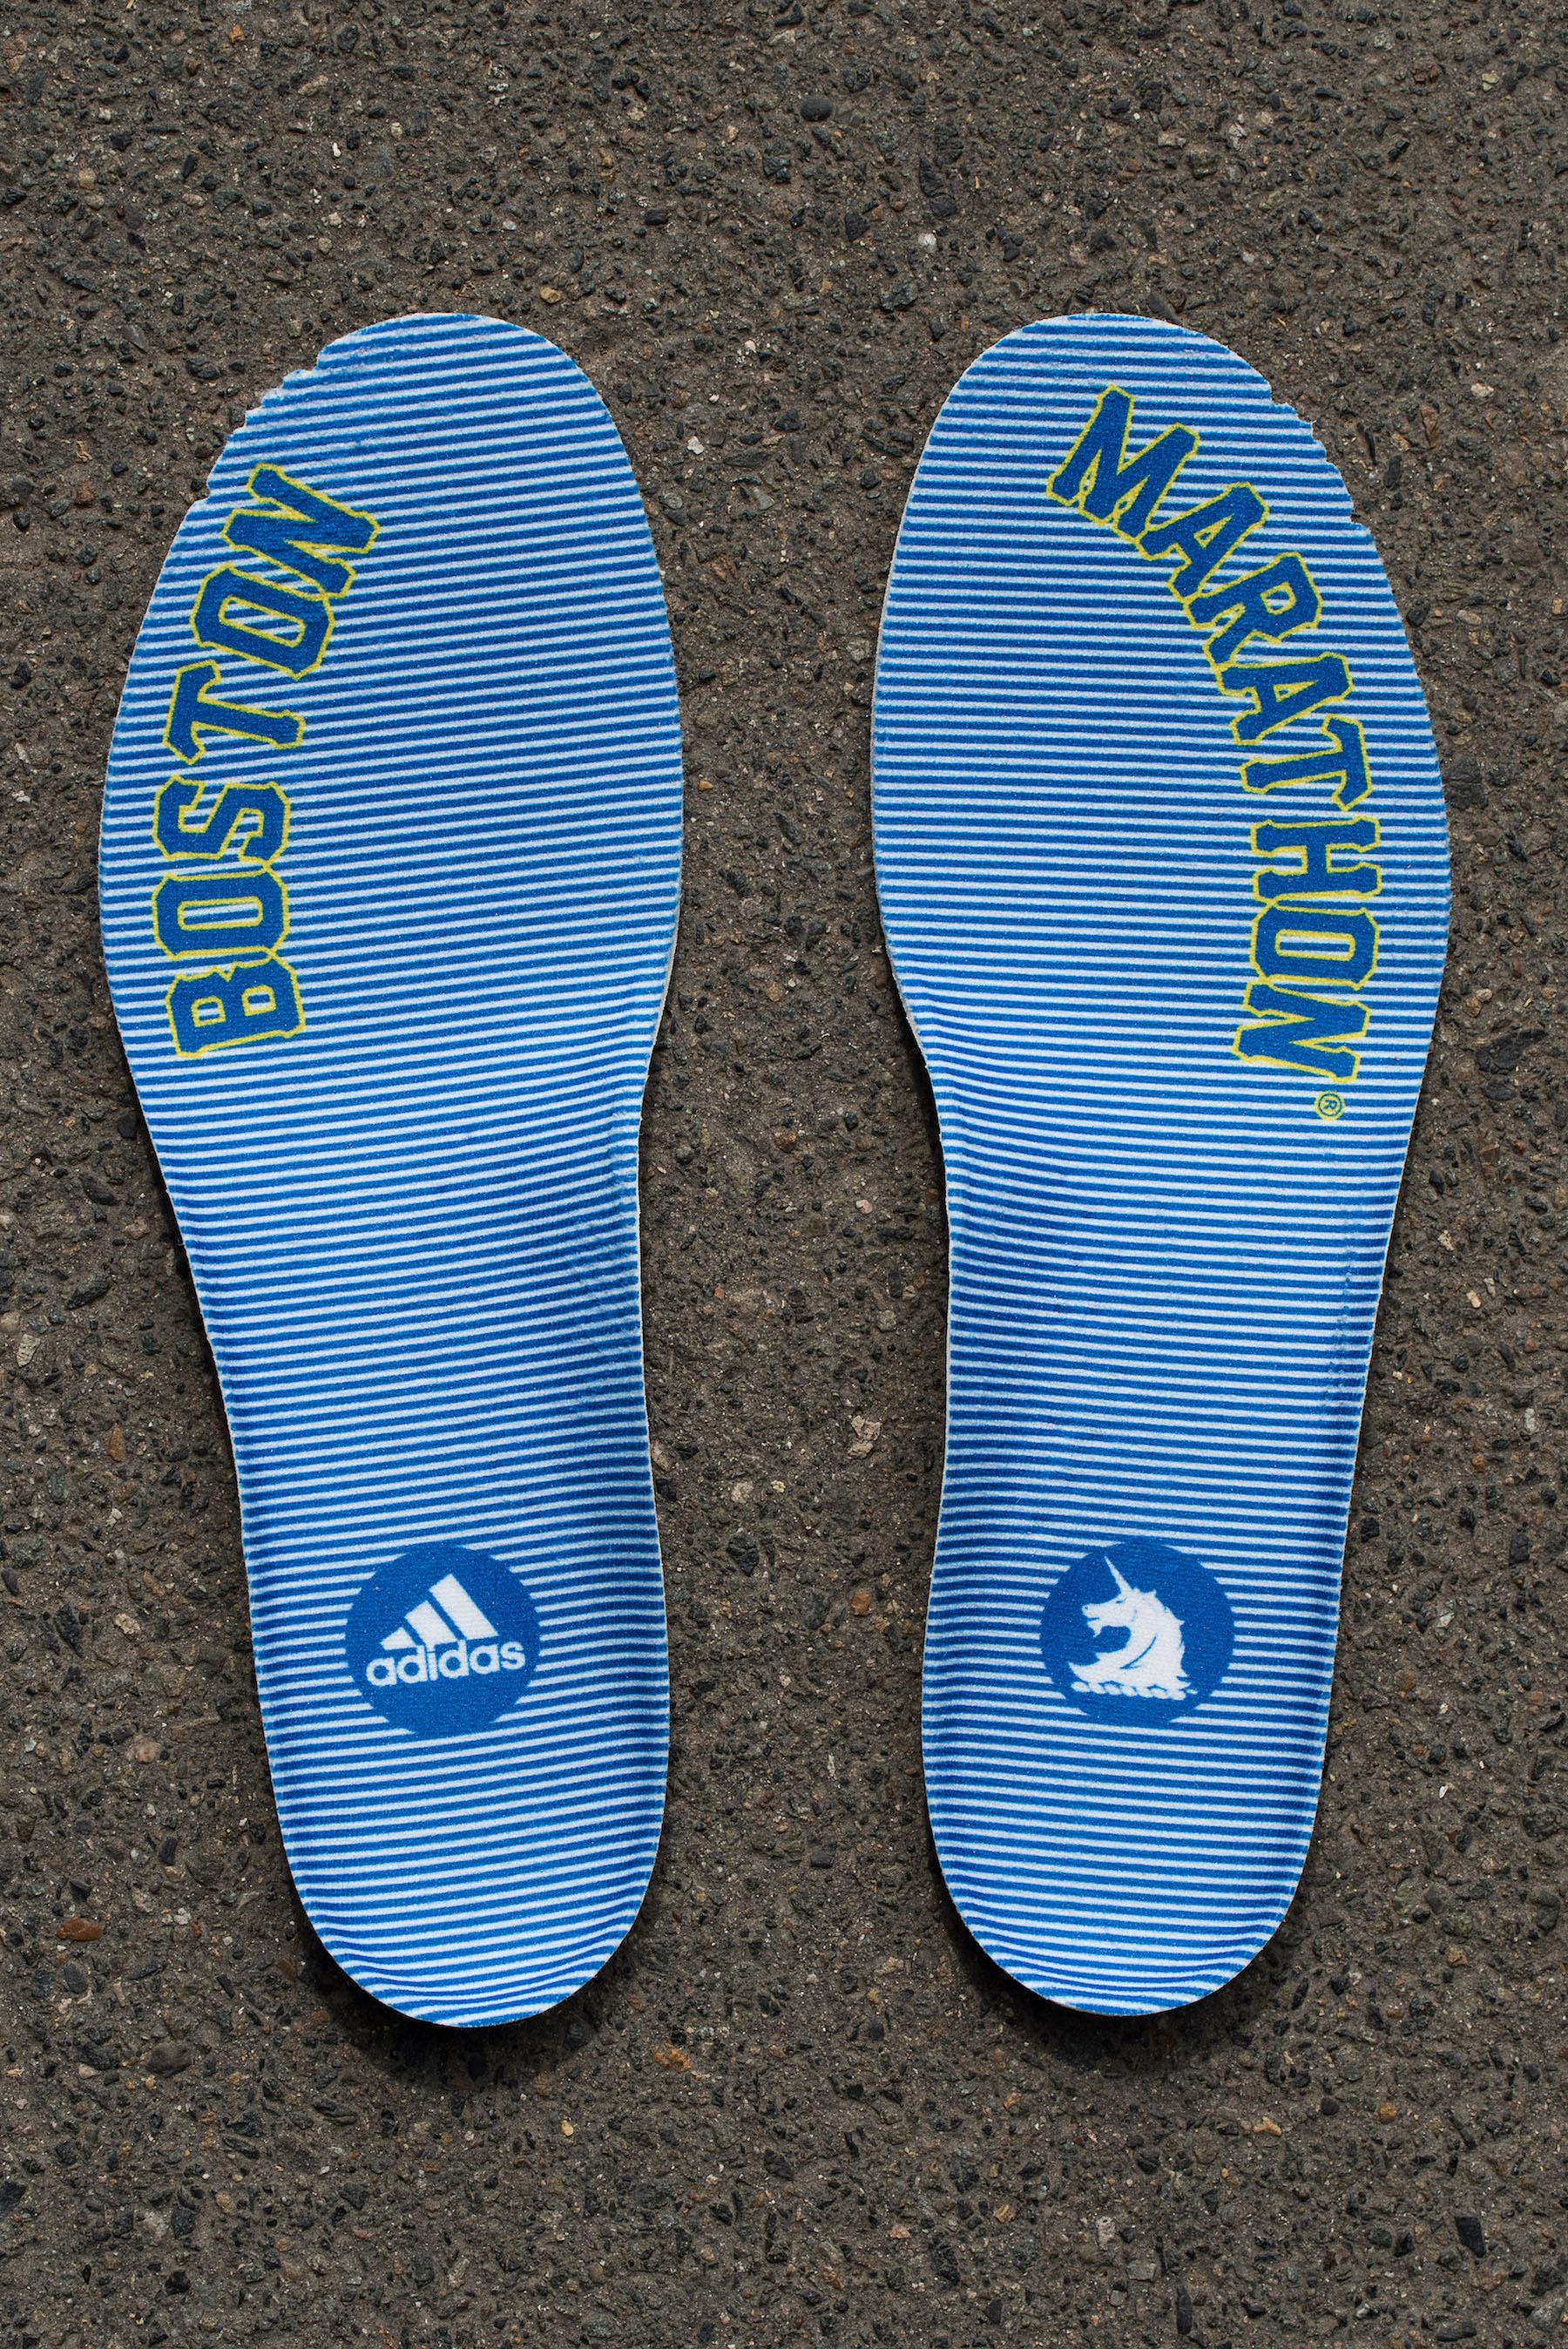 adidas Kathrine Switzer 261 Fearless 2017 Boston Marathon 10